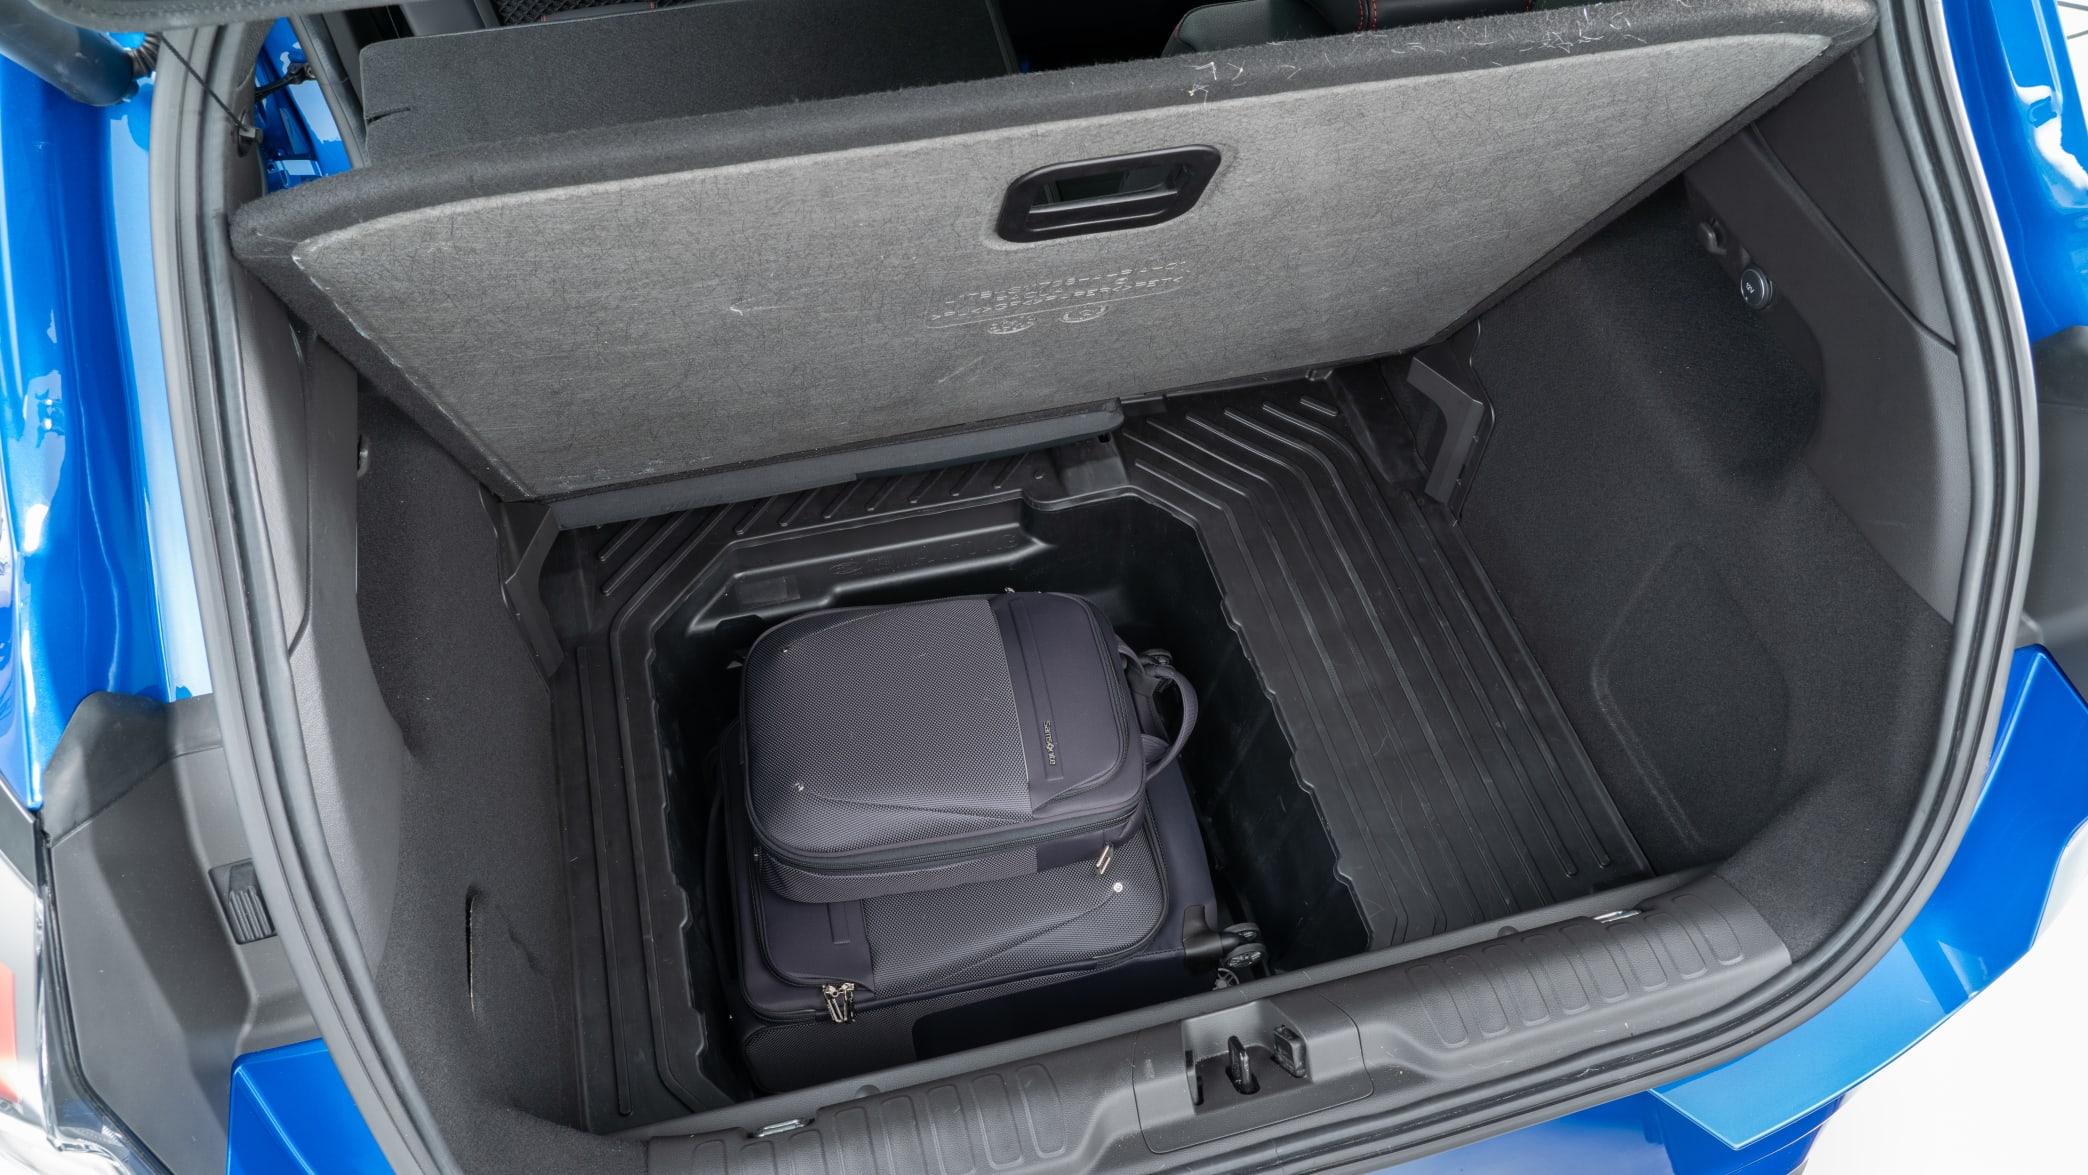 Ford Puma beladener Kofferraum